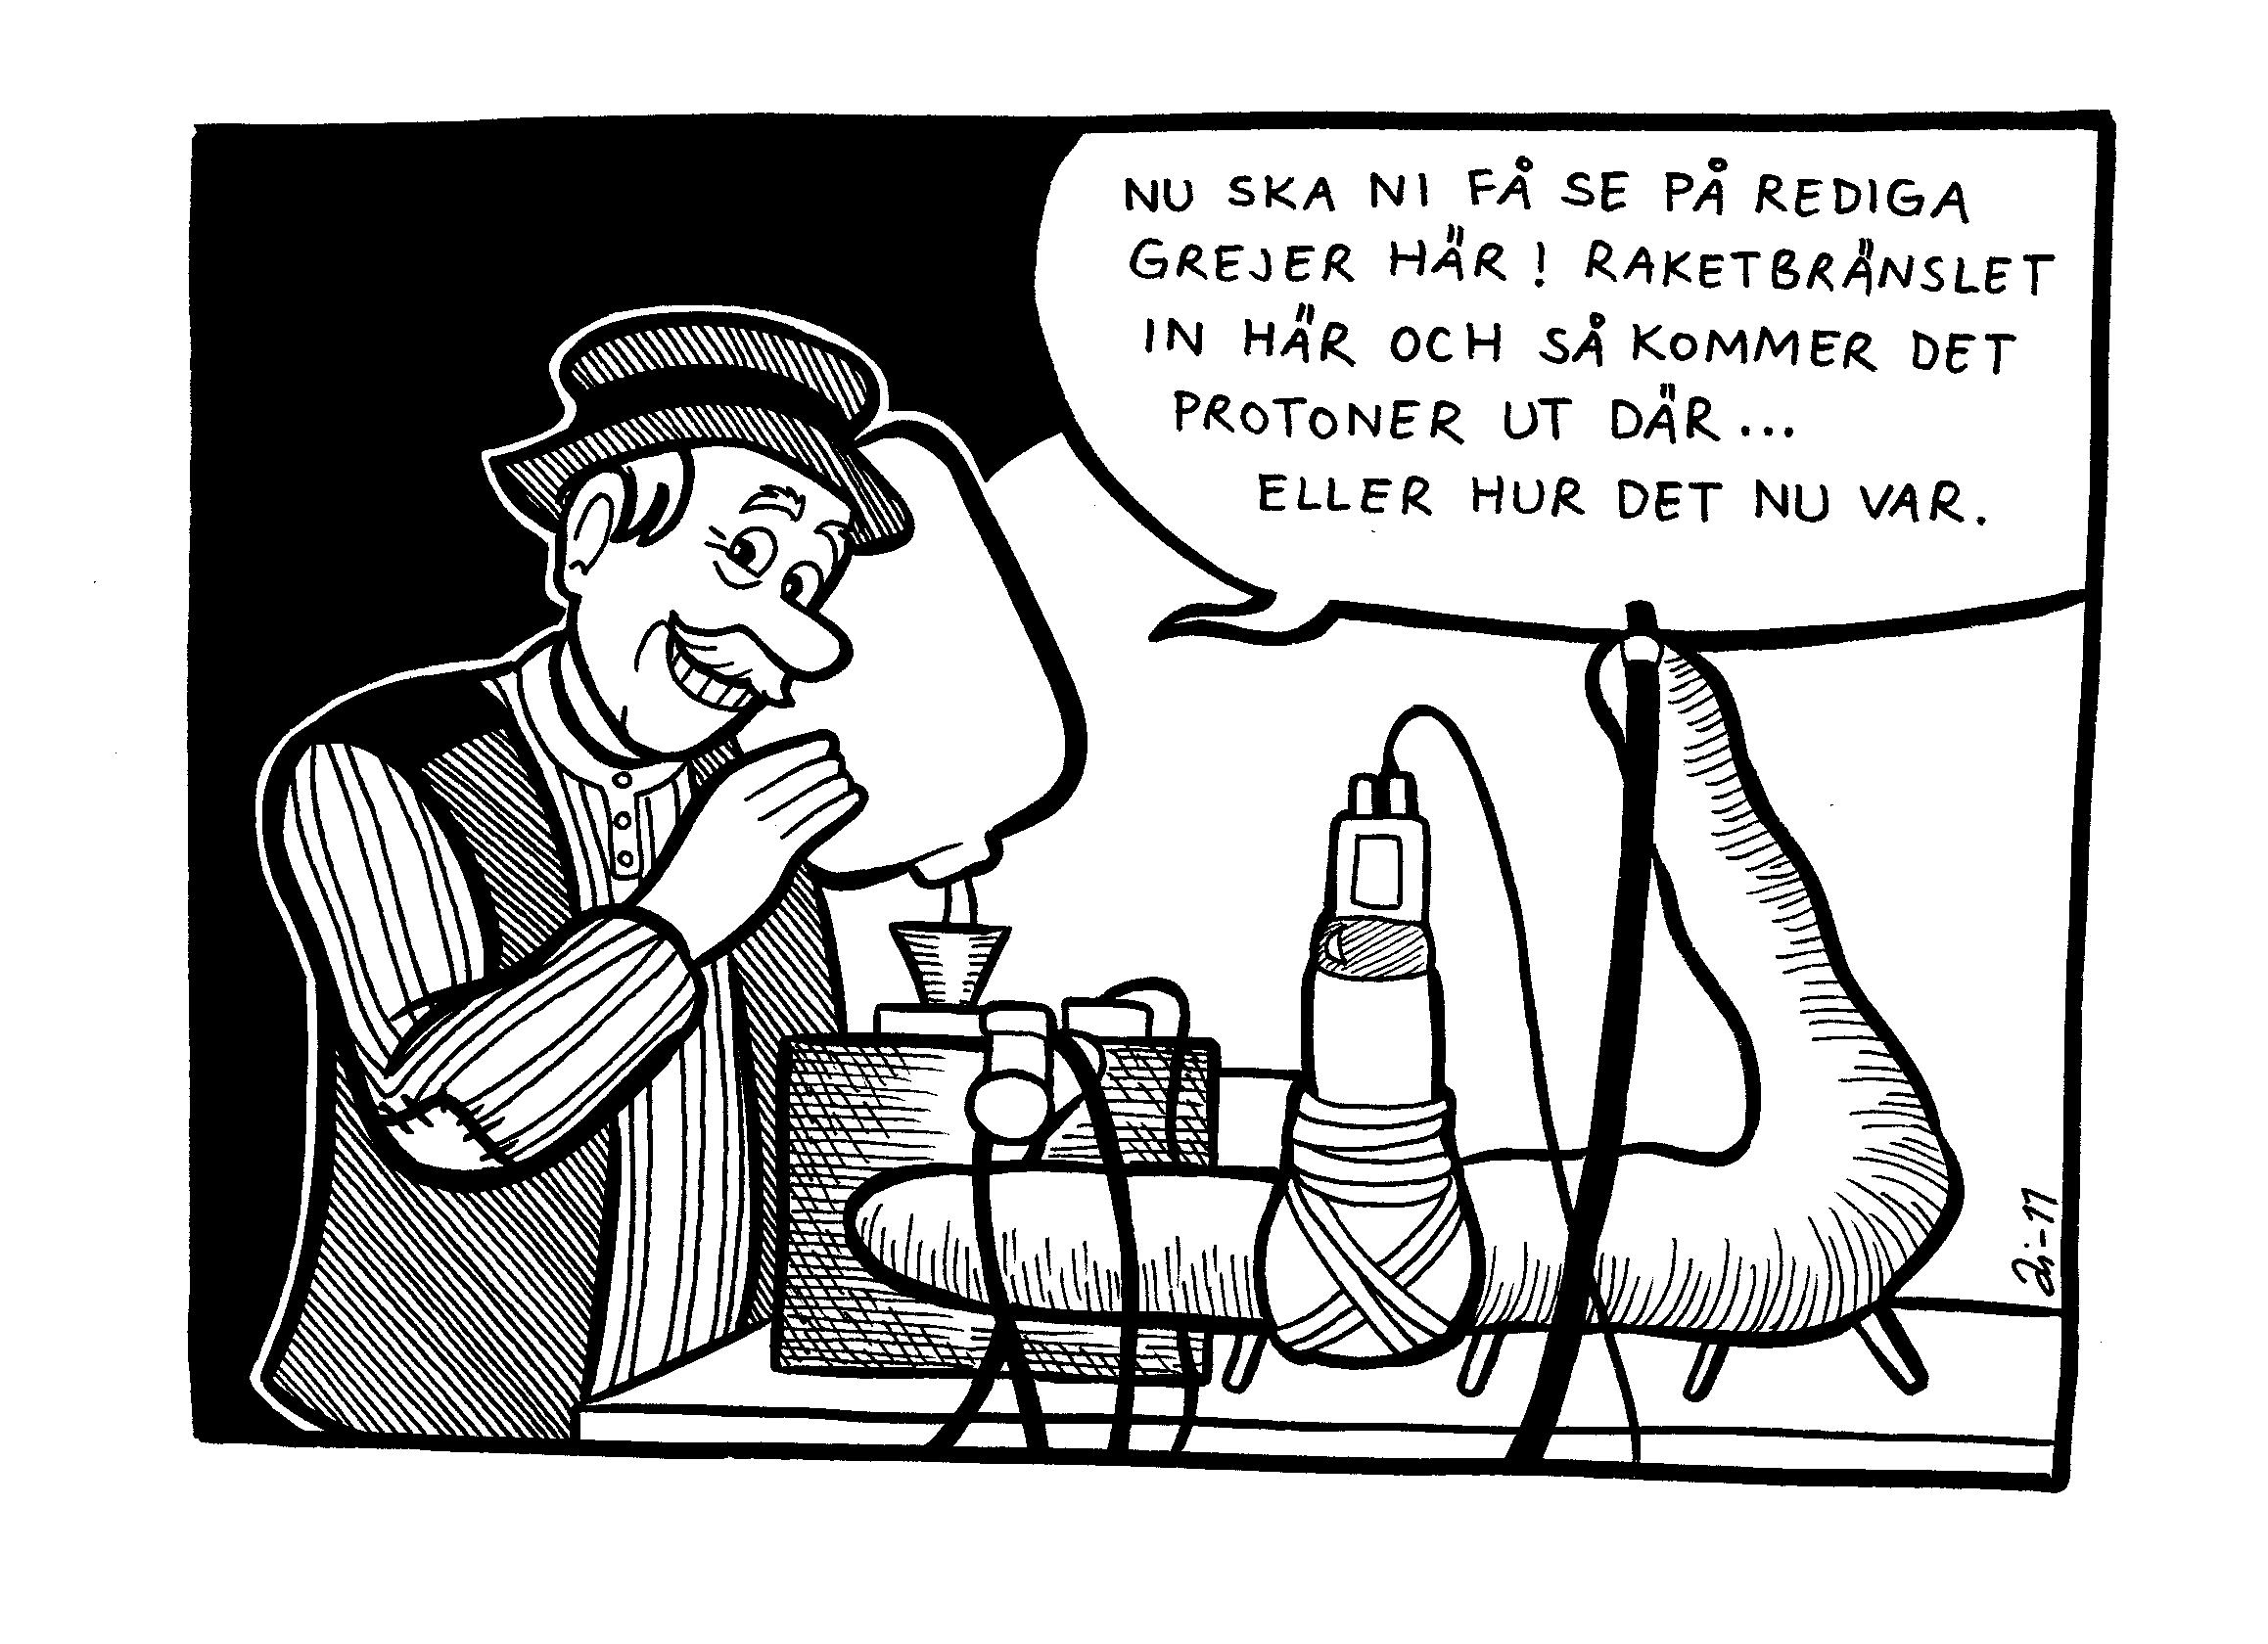 Bild: Li Österberg  Text: Joacim Jonsson